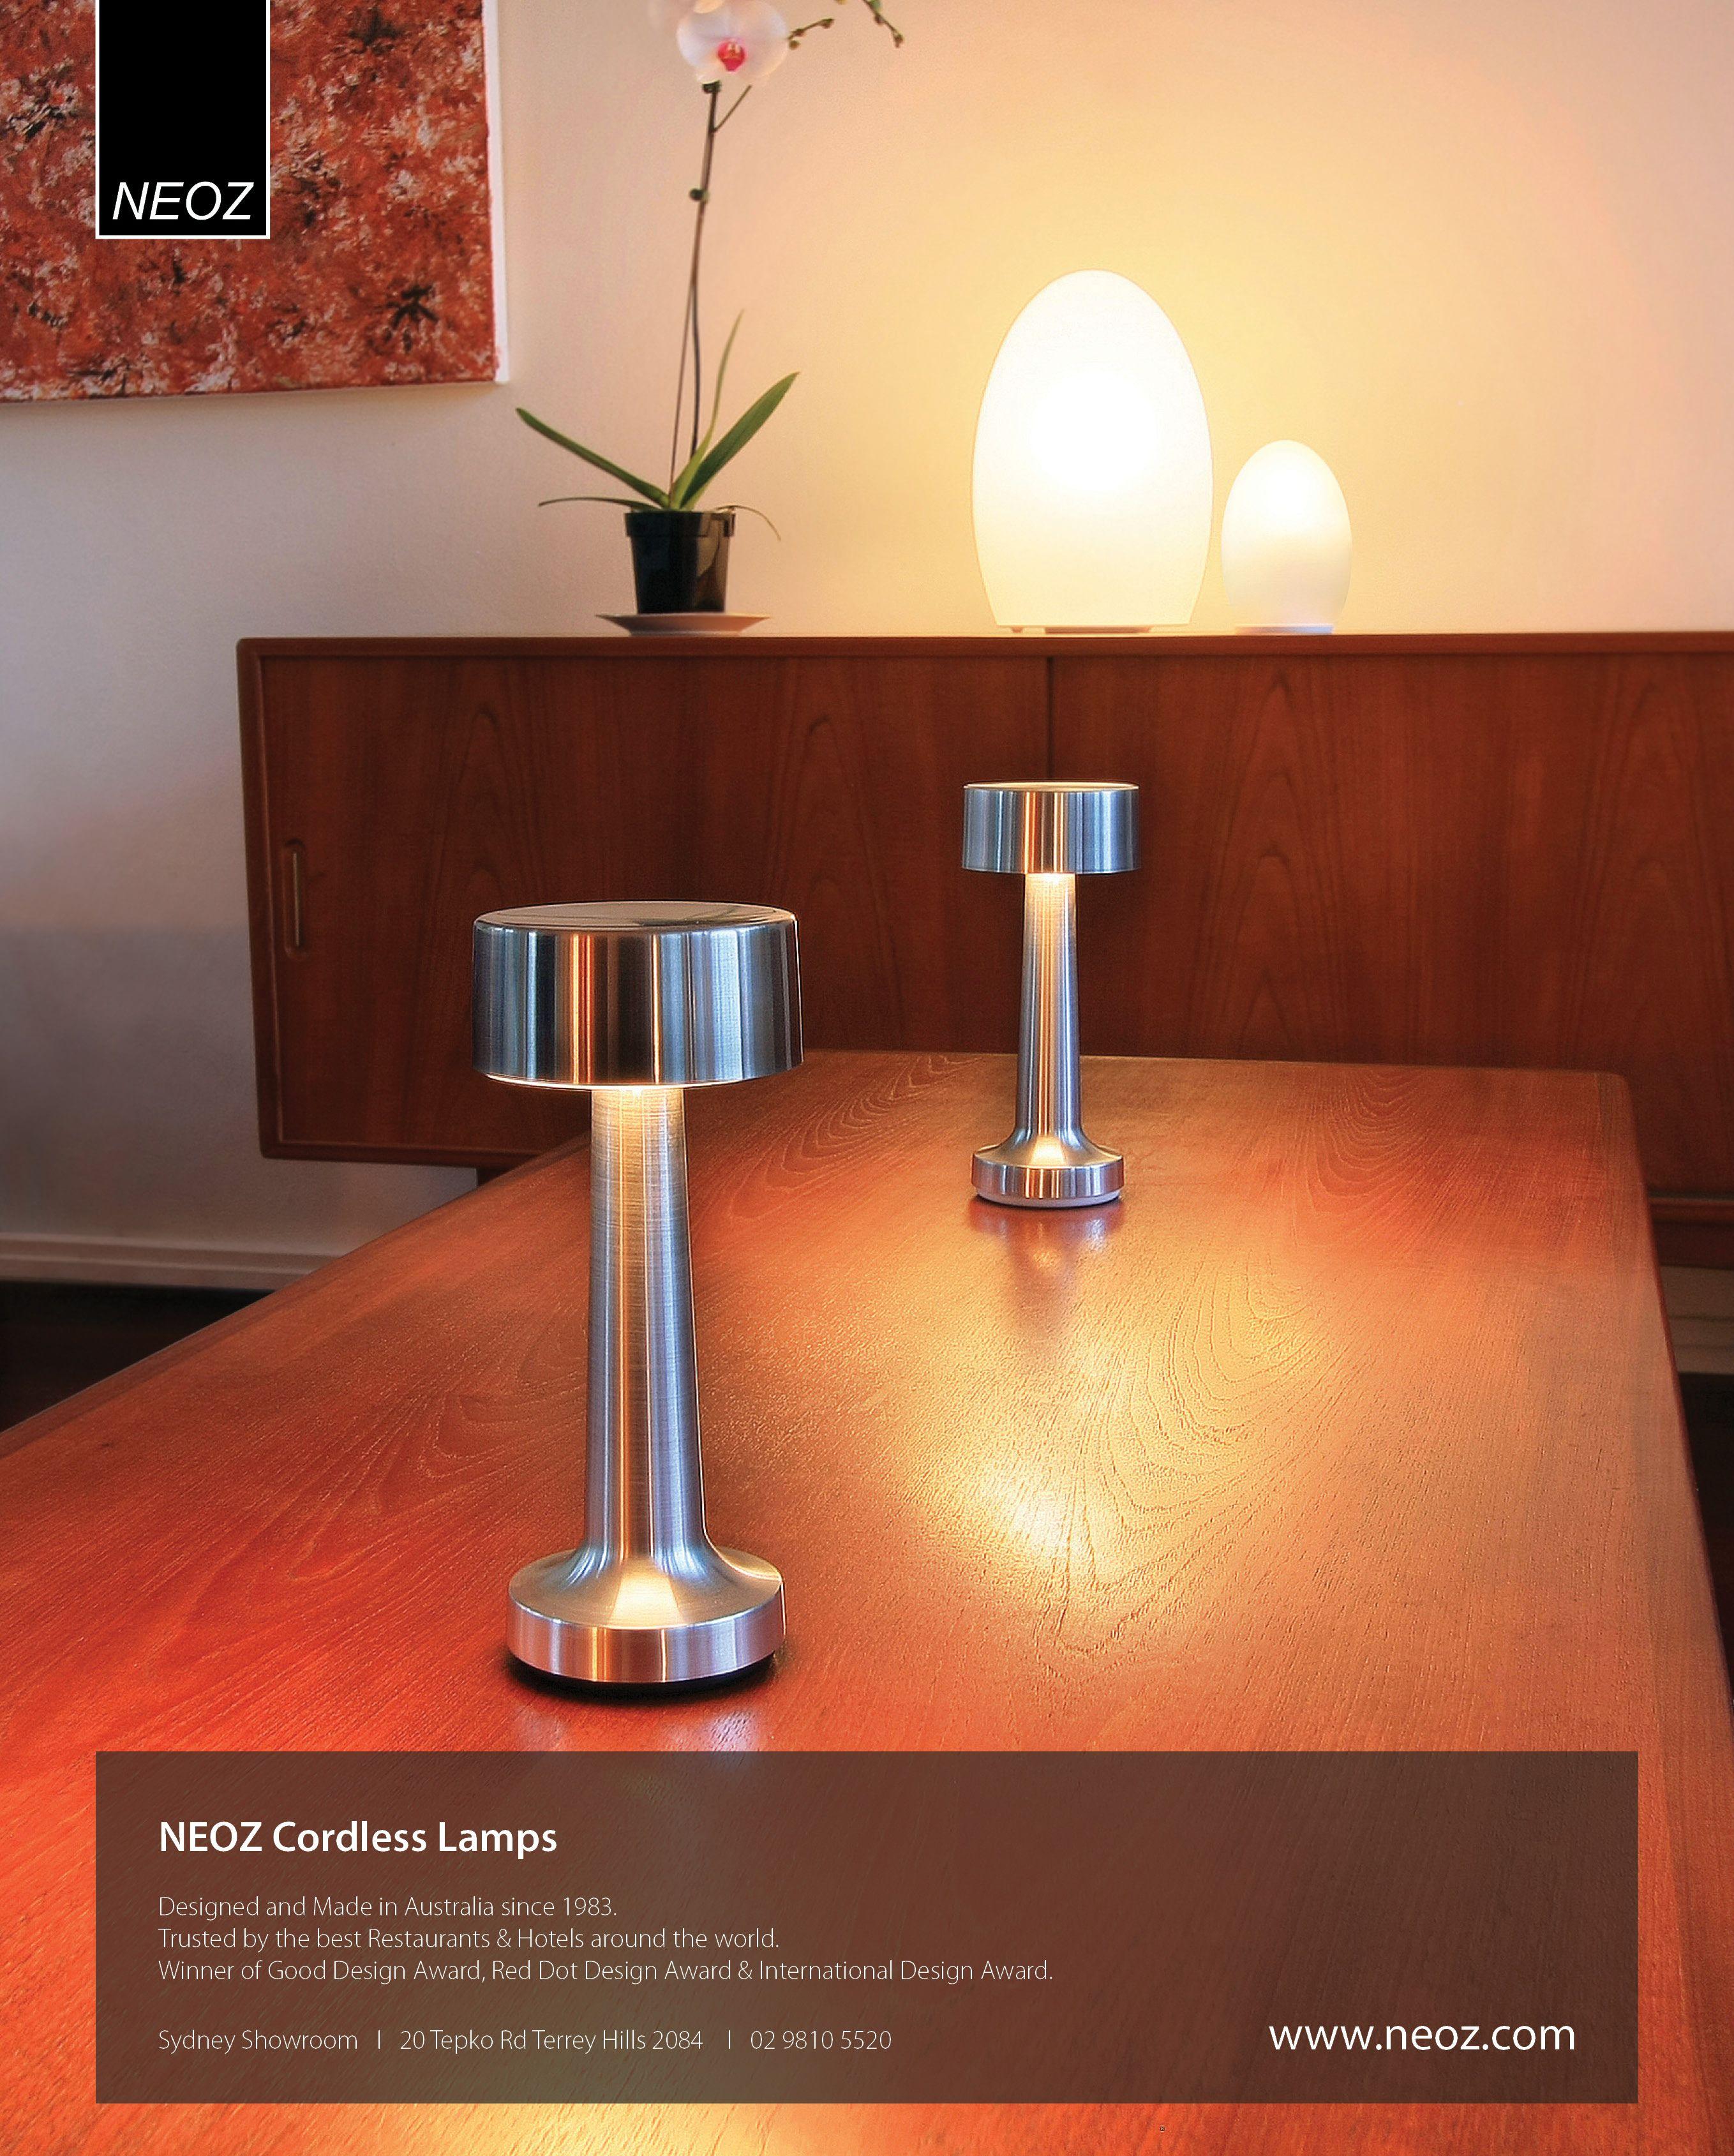 Www Neoz Com Neoz Cordless Lamp neoz   cooee 2c   copper color   cordless lamps, lamp design